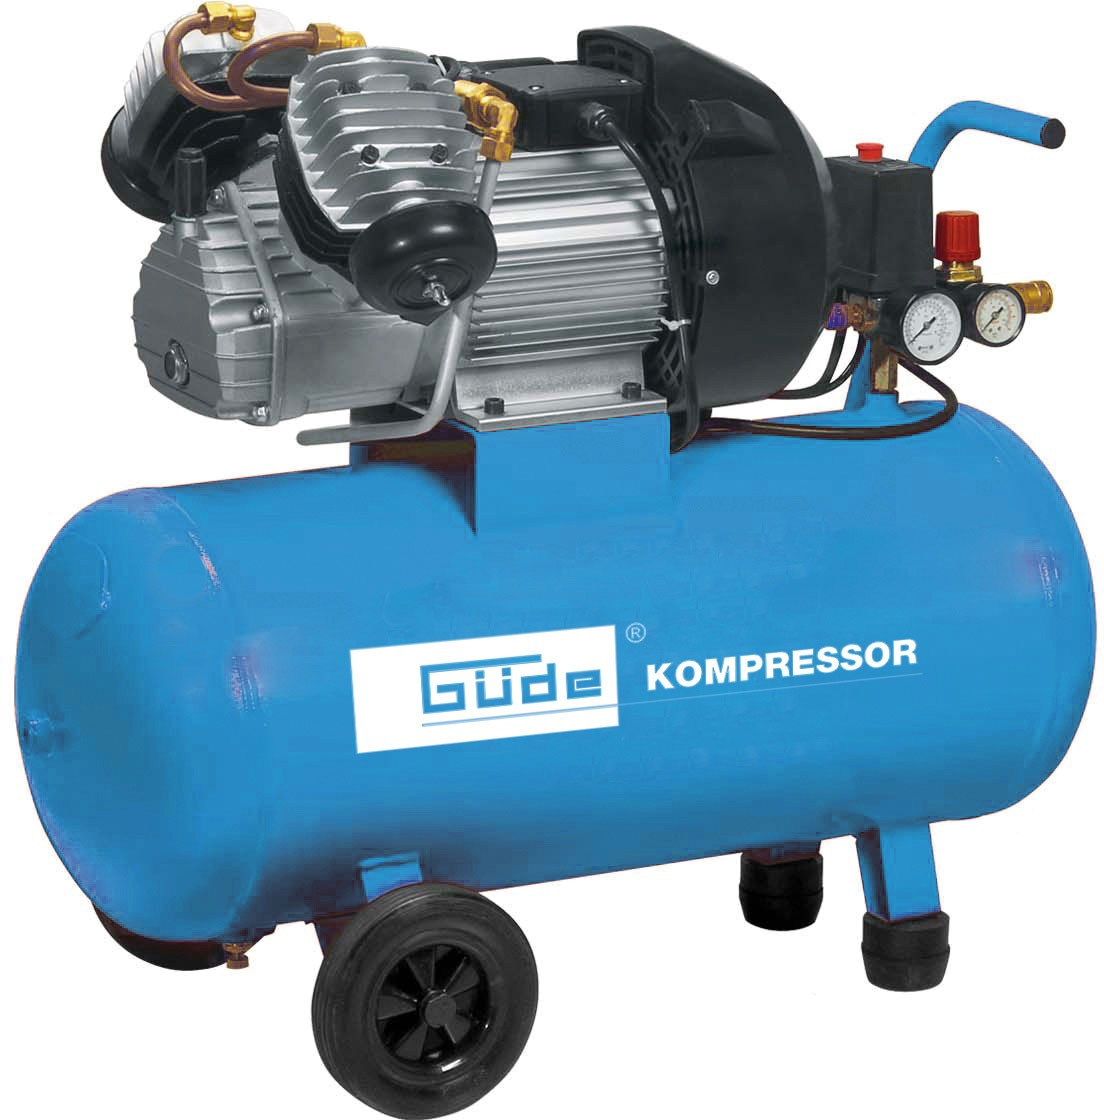 Kompressor 400/10/50 DG Güde 15-teiliges Set Bild 1